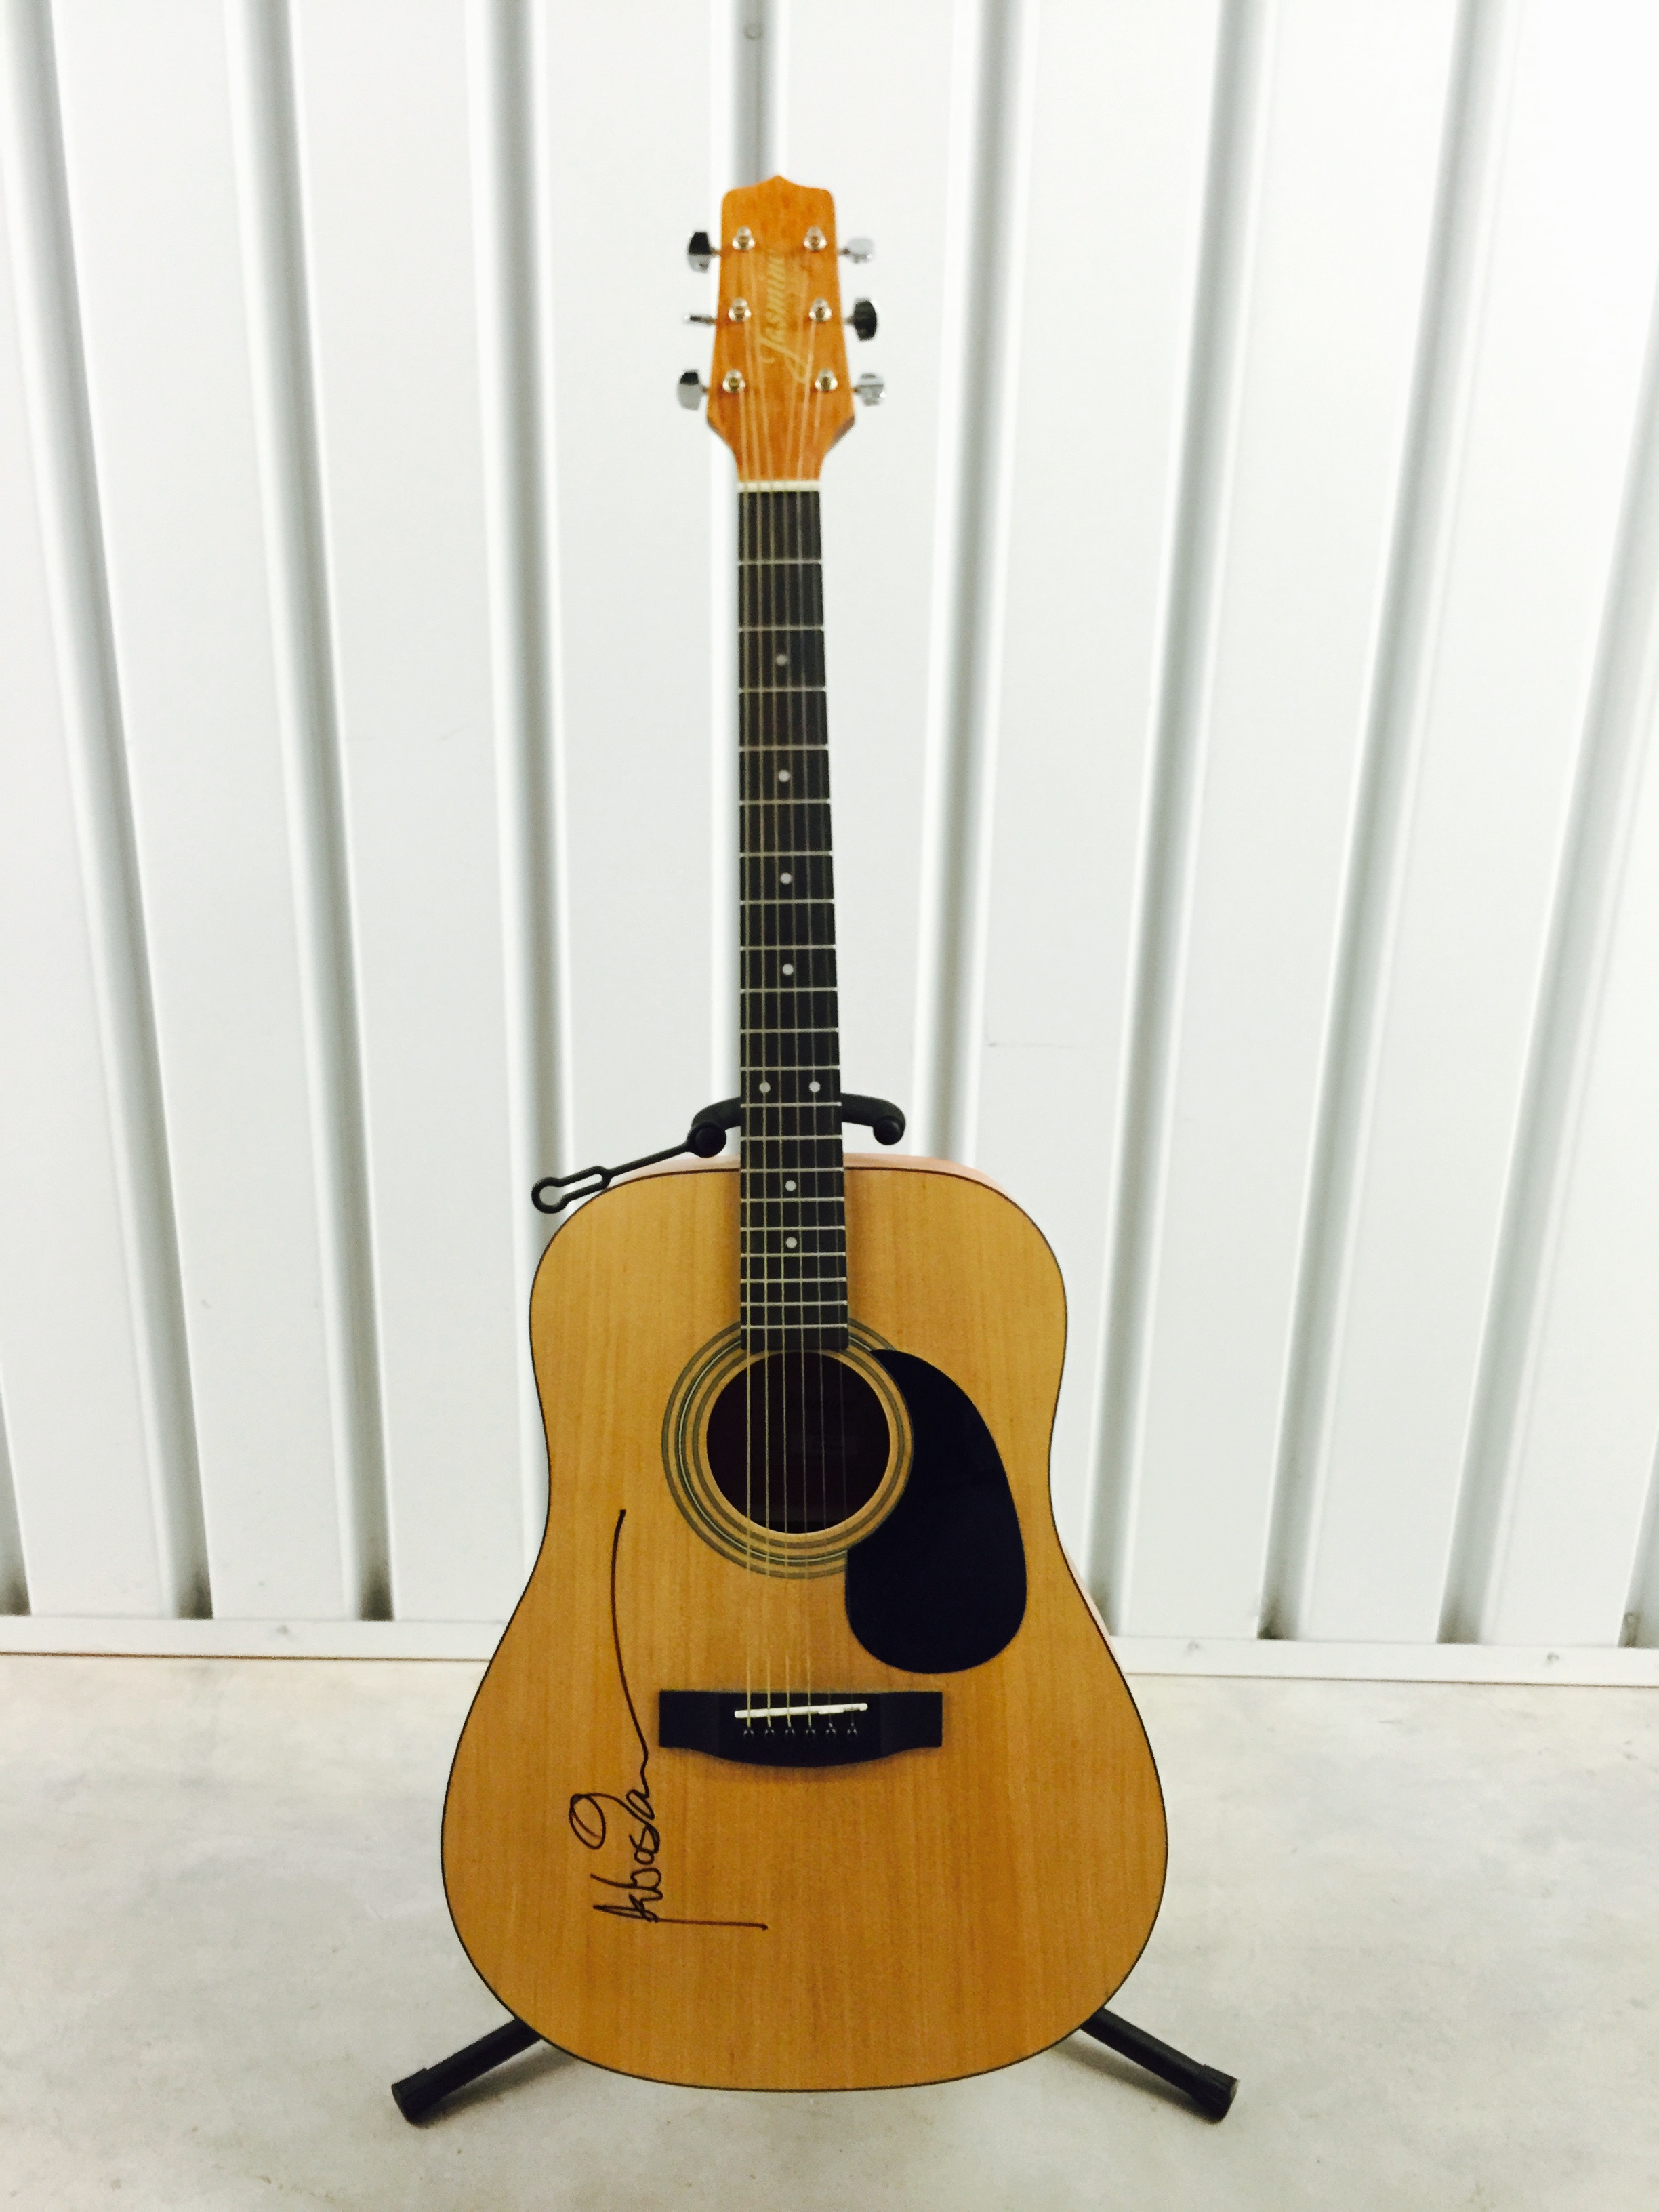 charitybuzz sebastian bach takamine jasmine autographed guitar lot 861103. Black Bedroom Furniture Sets. Home Design Ideas